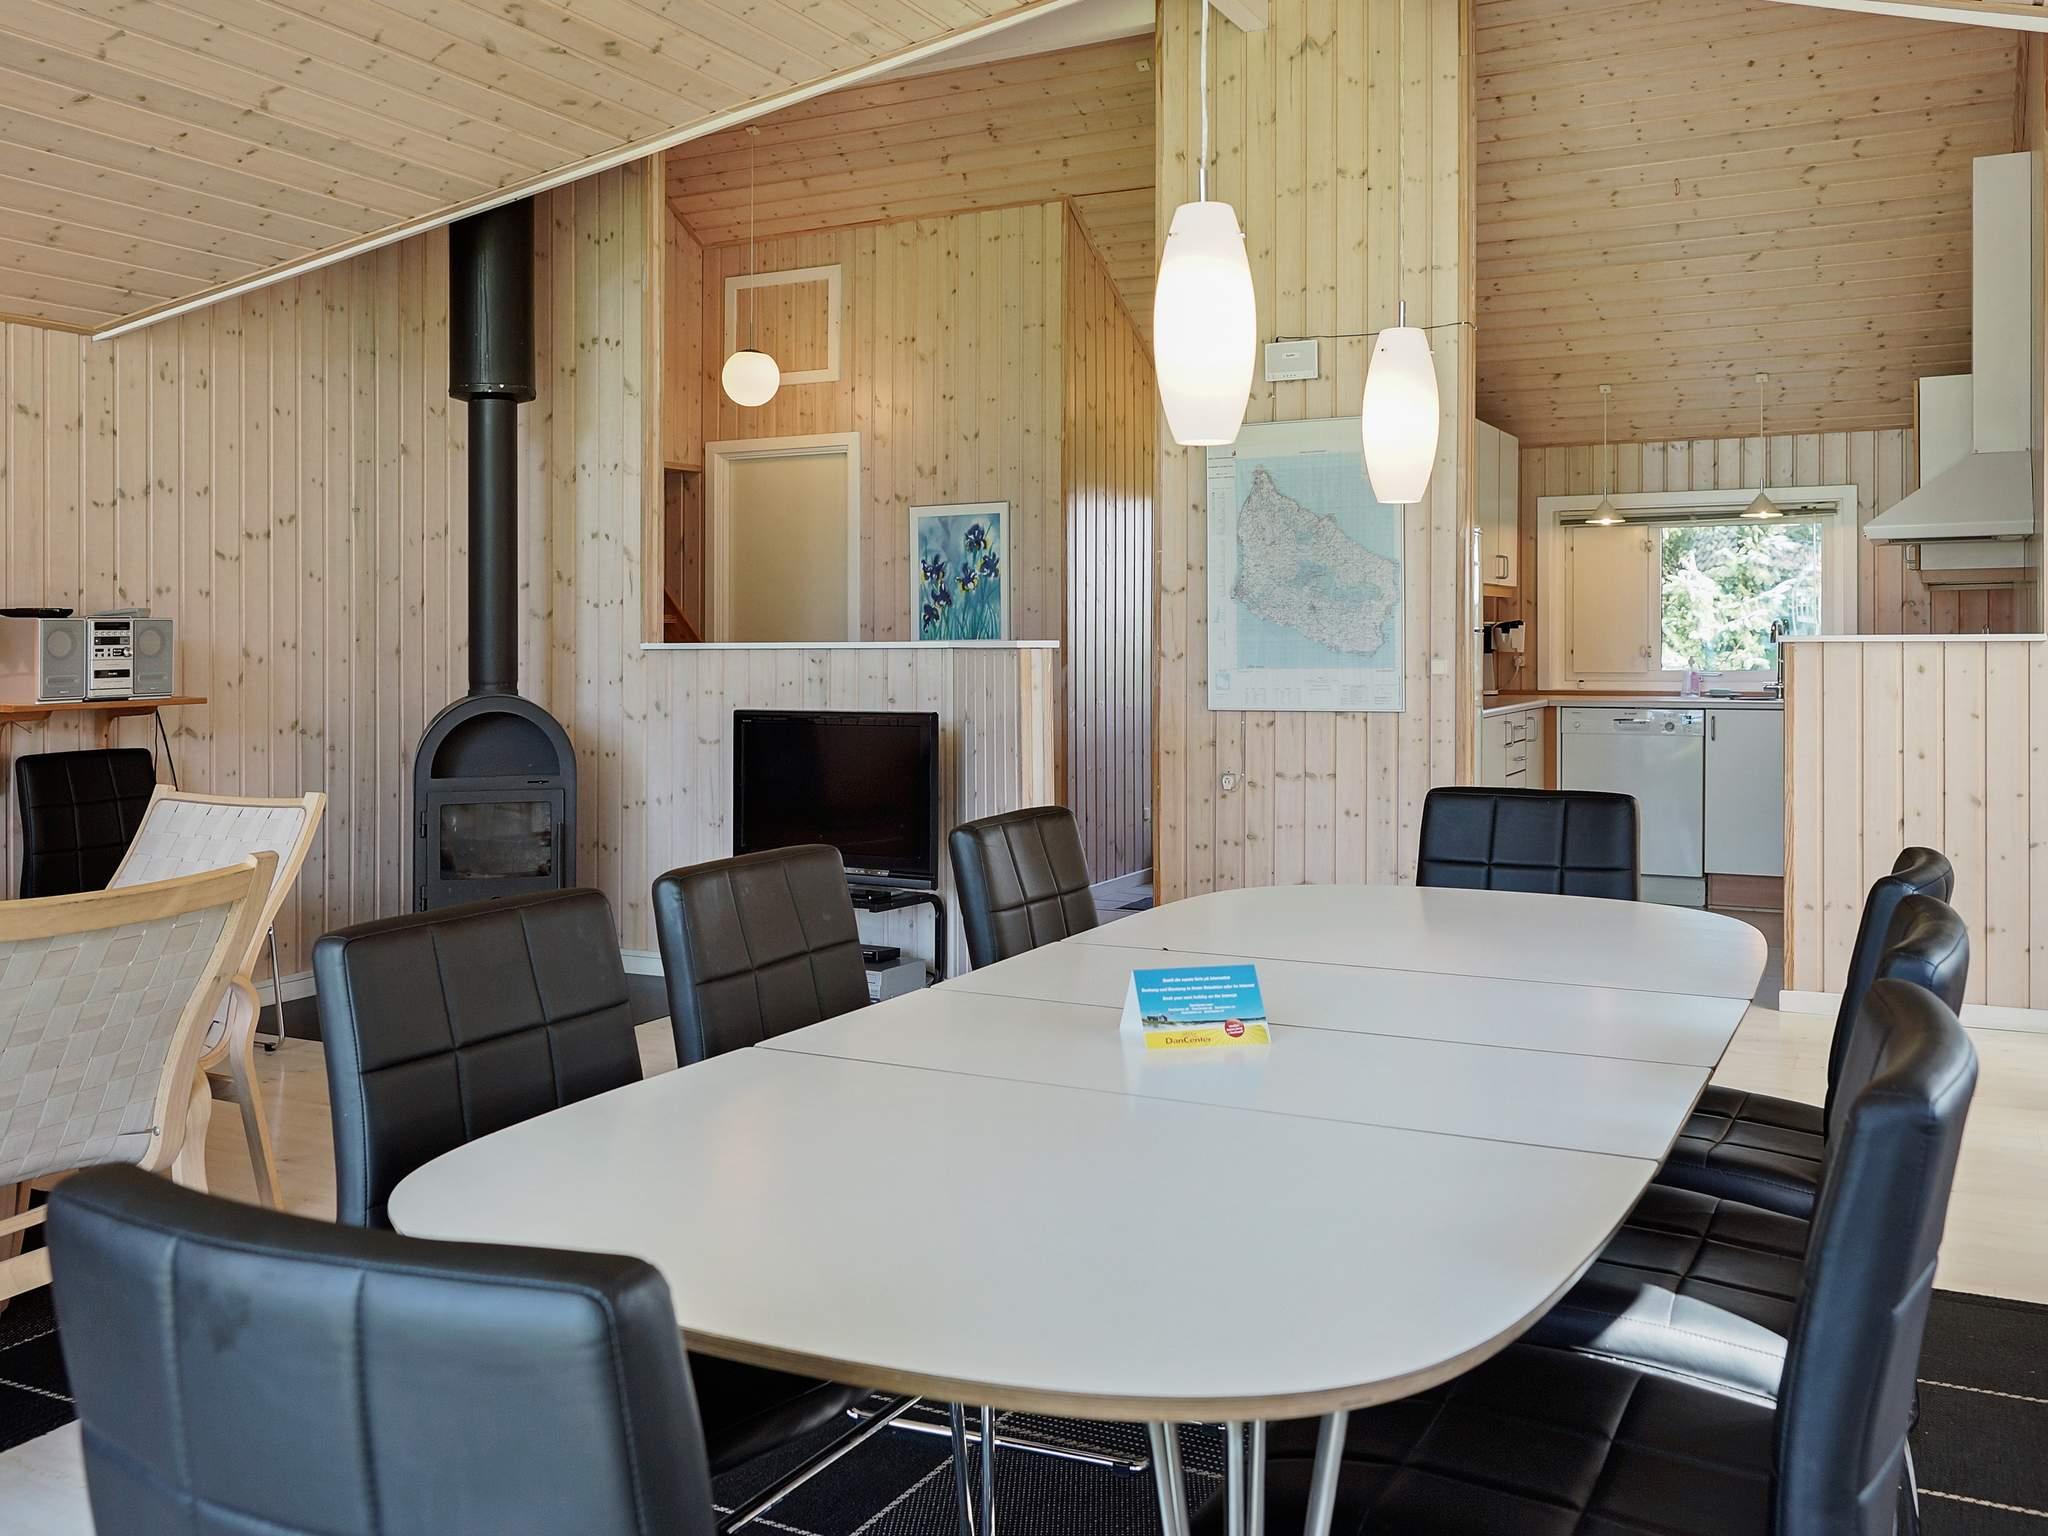 Maison de vacances Østre Sømarken (82470), Aakirkeby, , Bornholm, Danemark, image 3